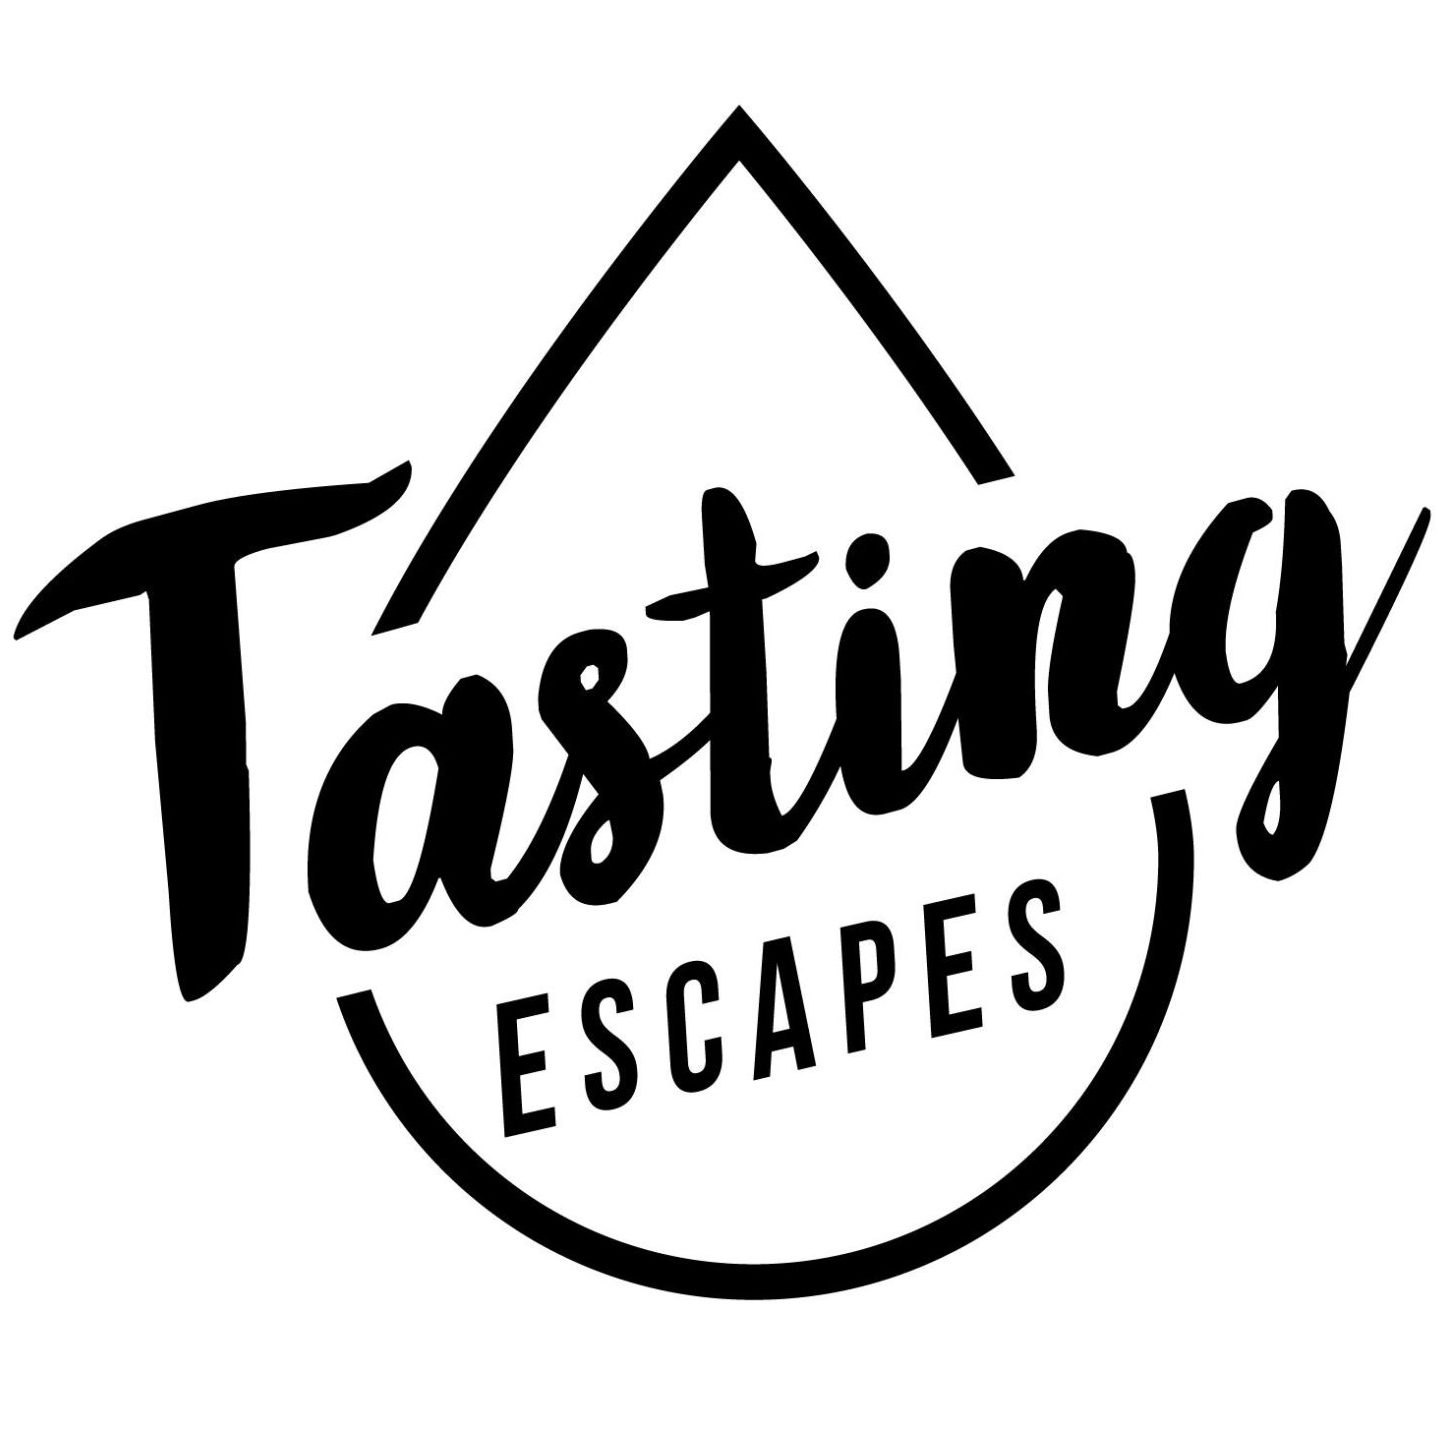 tasting-escapes-logo-e1579087615874 Partners